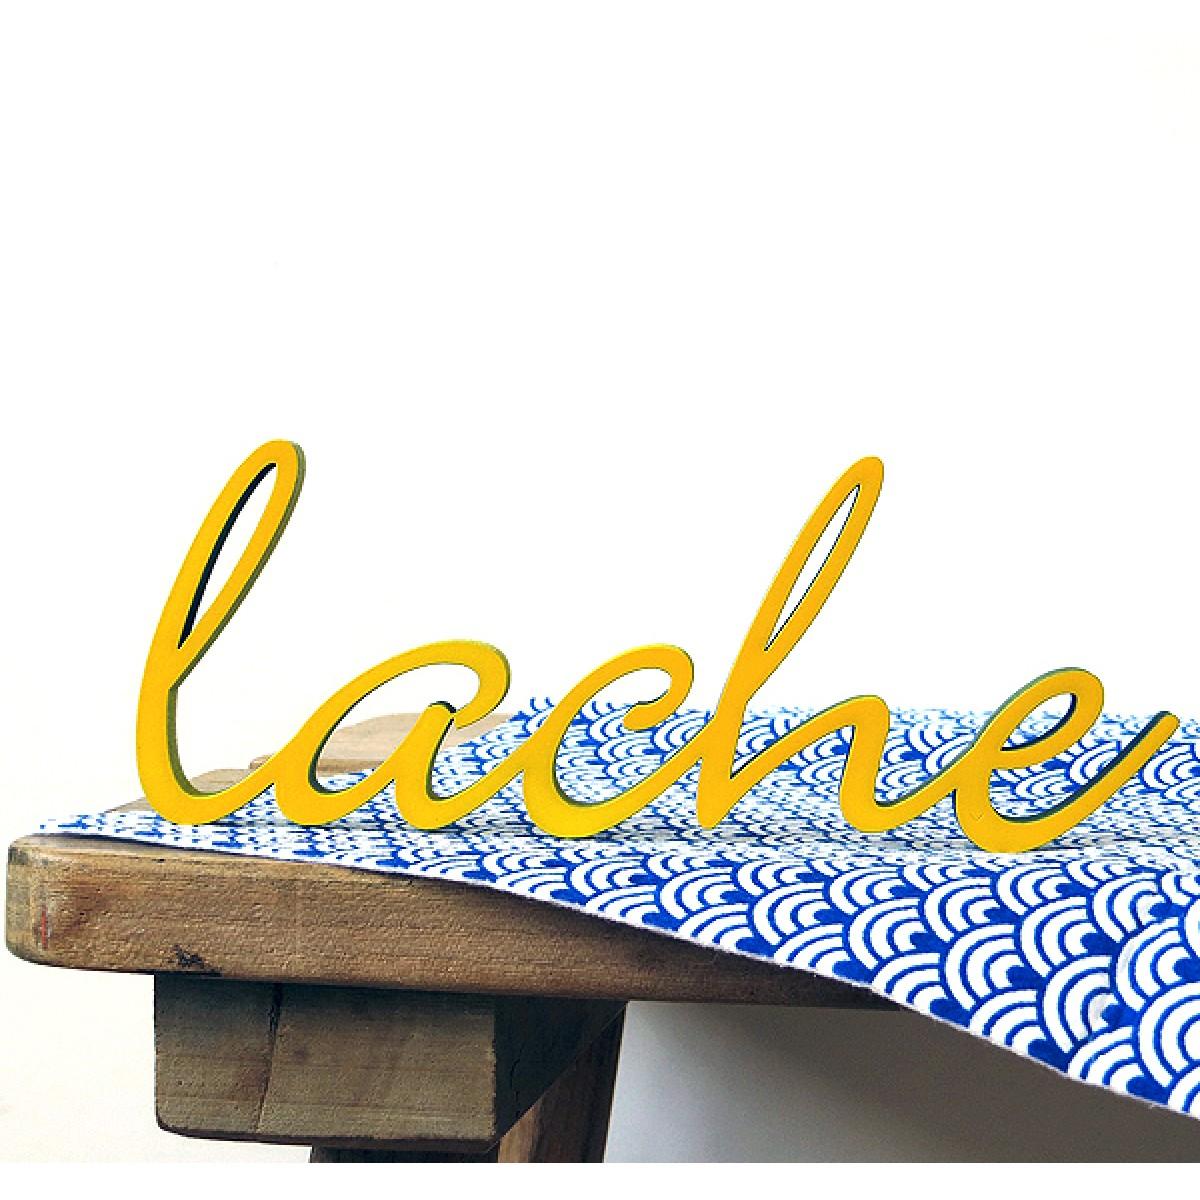 NOGALLERY Lache - Deko Schriftzug Holz